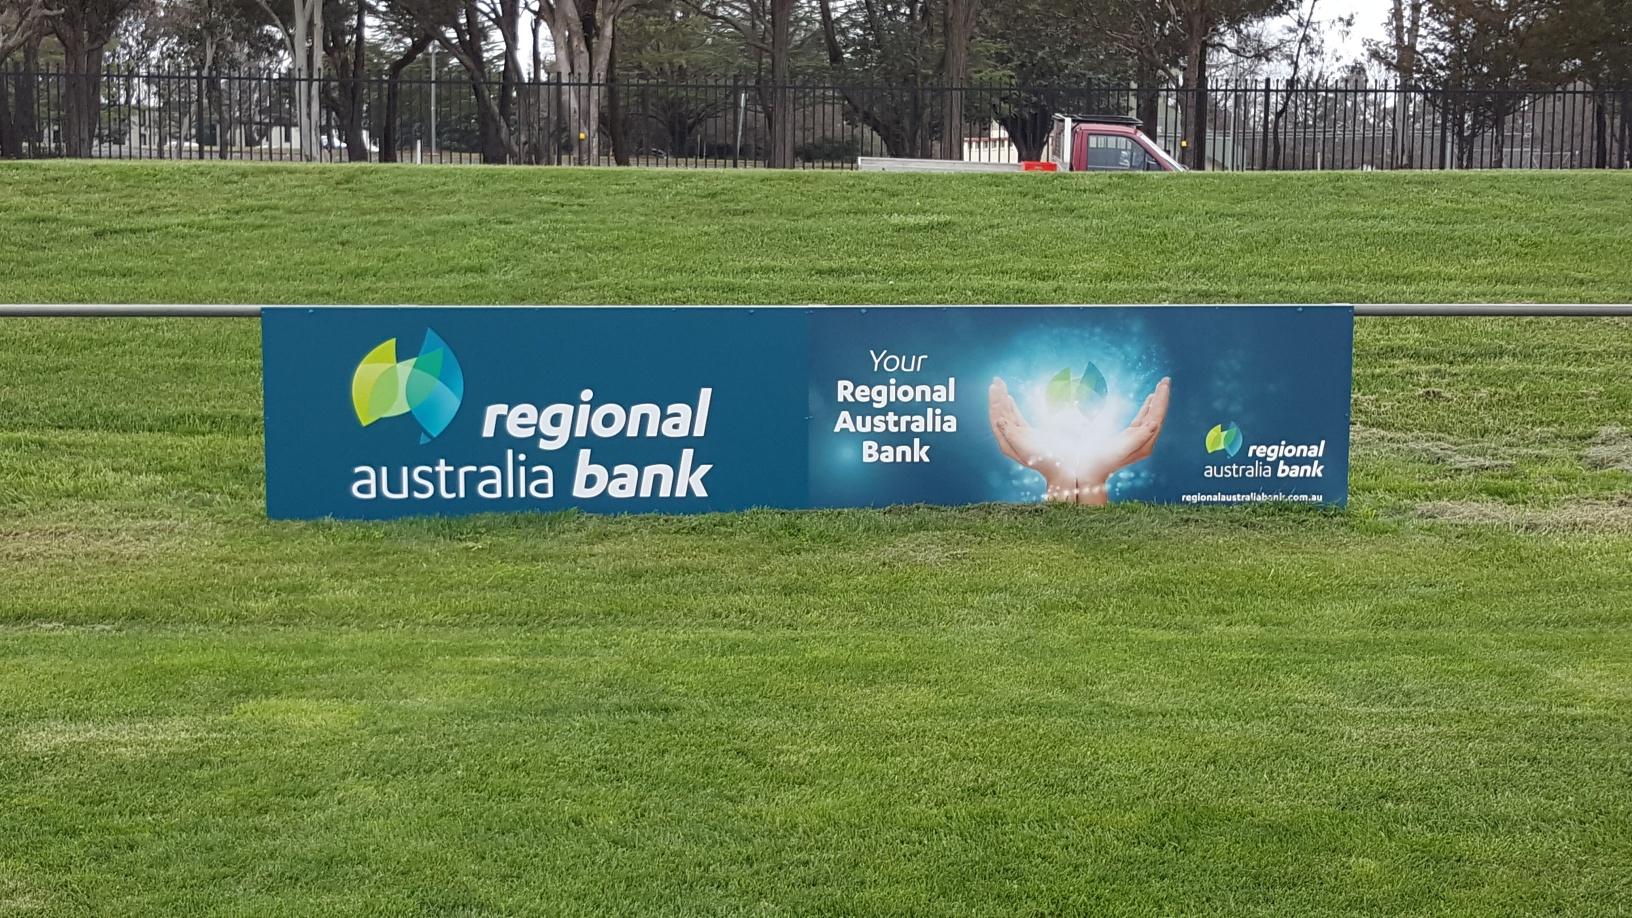 AOK Signs - Regonal Australia Bank